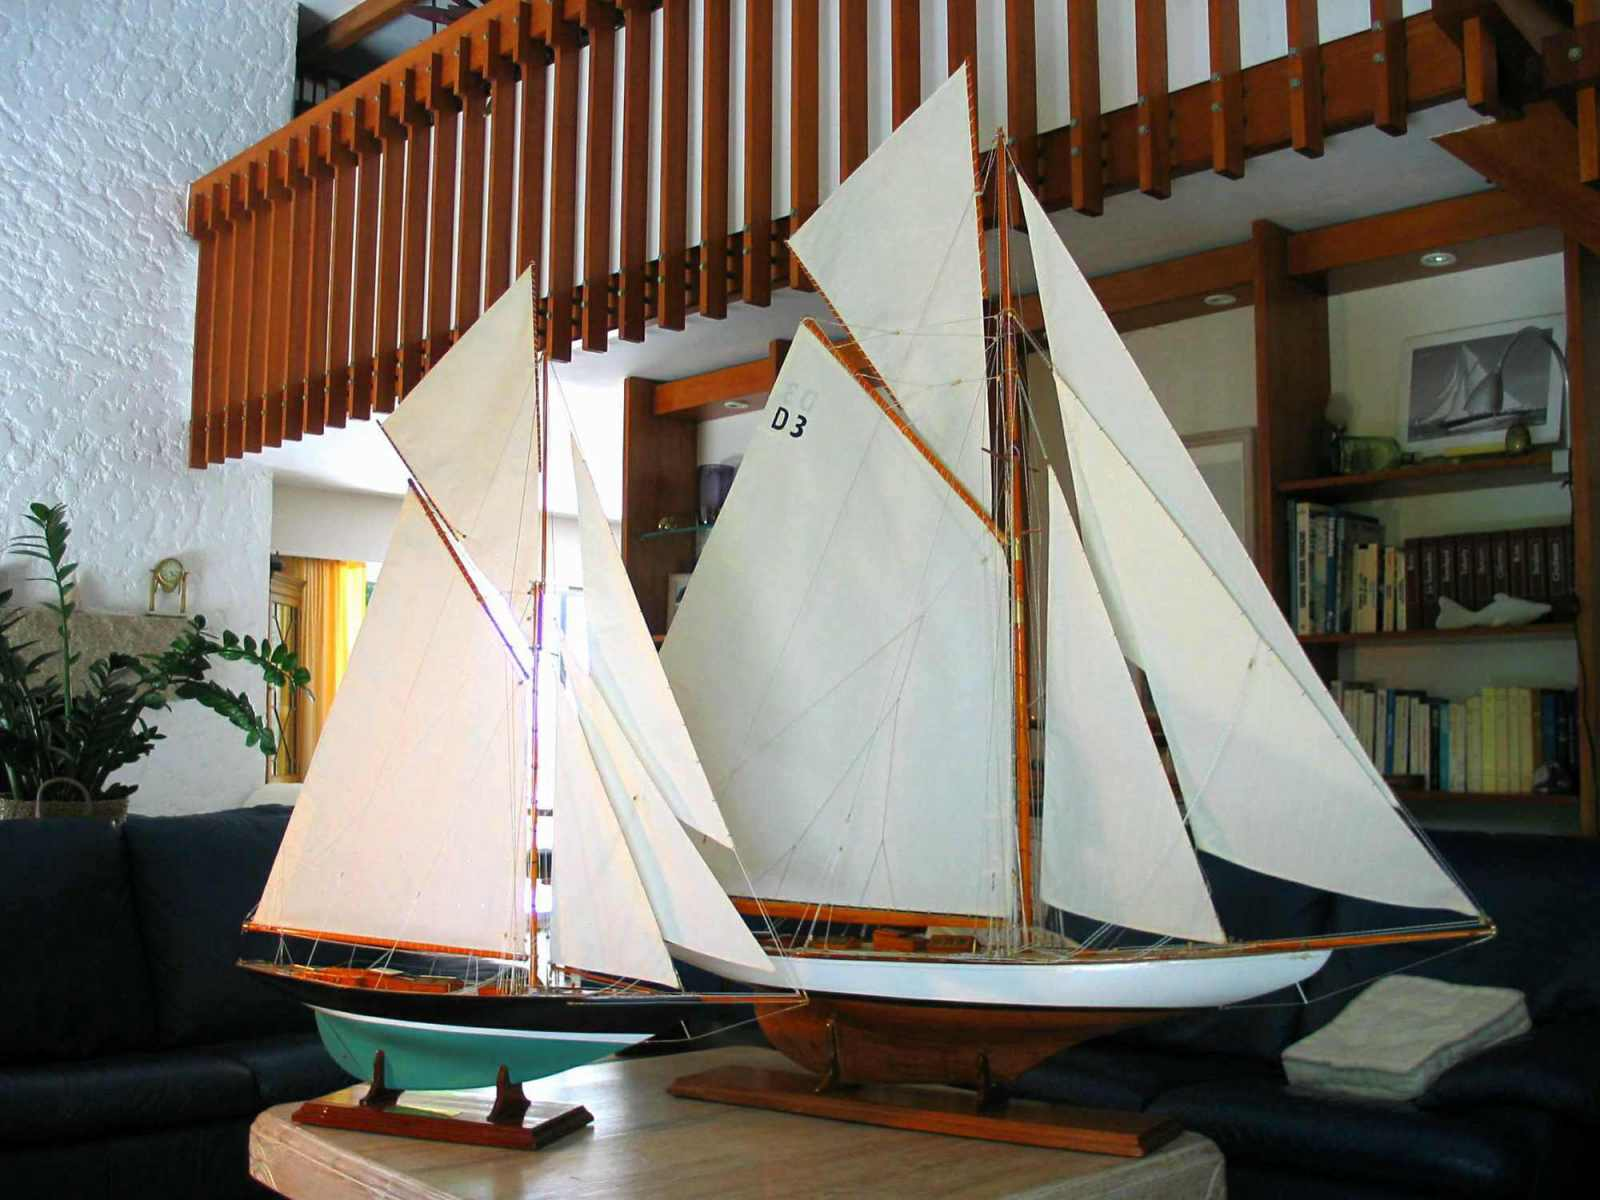 Maquette de Tuiga Yacht classique Bateau de classe JI Voilier Plan William Fife